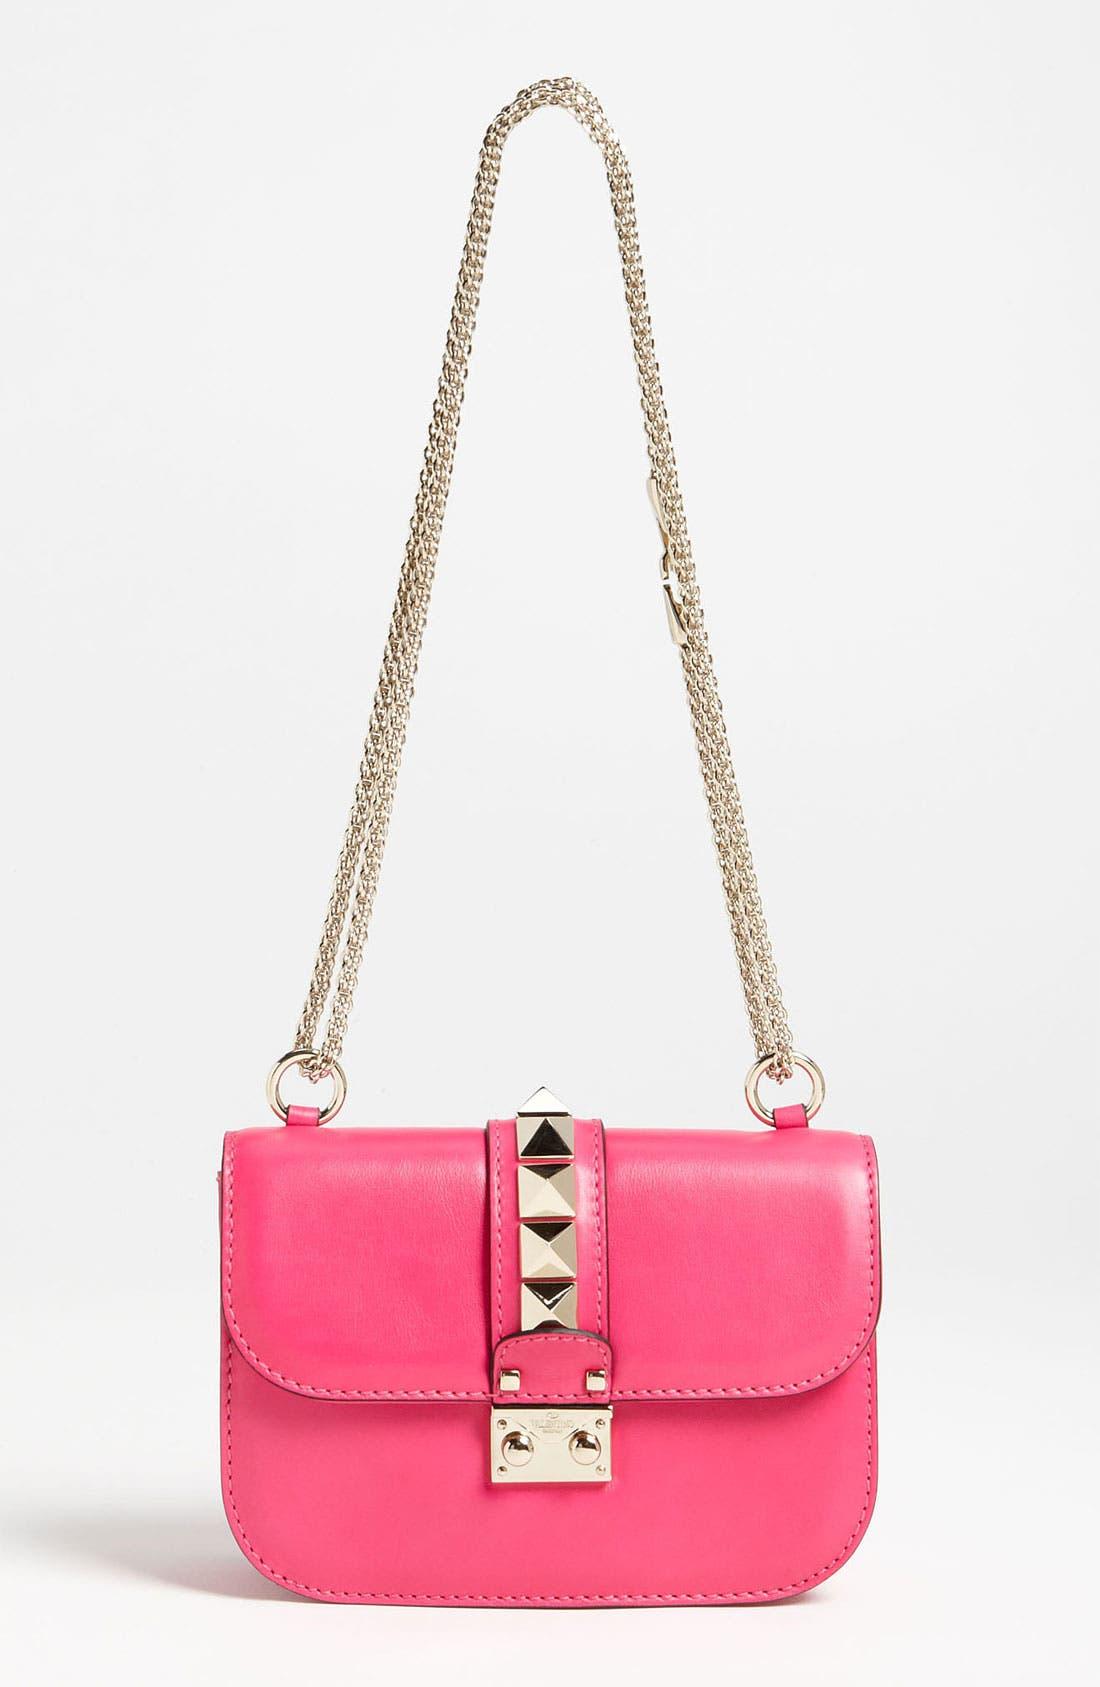 Main Image - Valentino 'Lock - Small' Leather Flap Bag